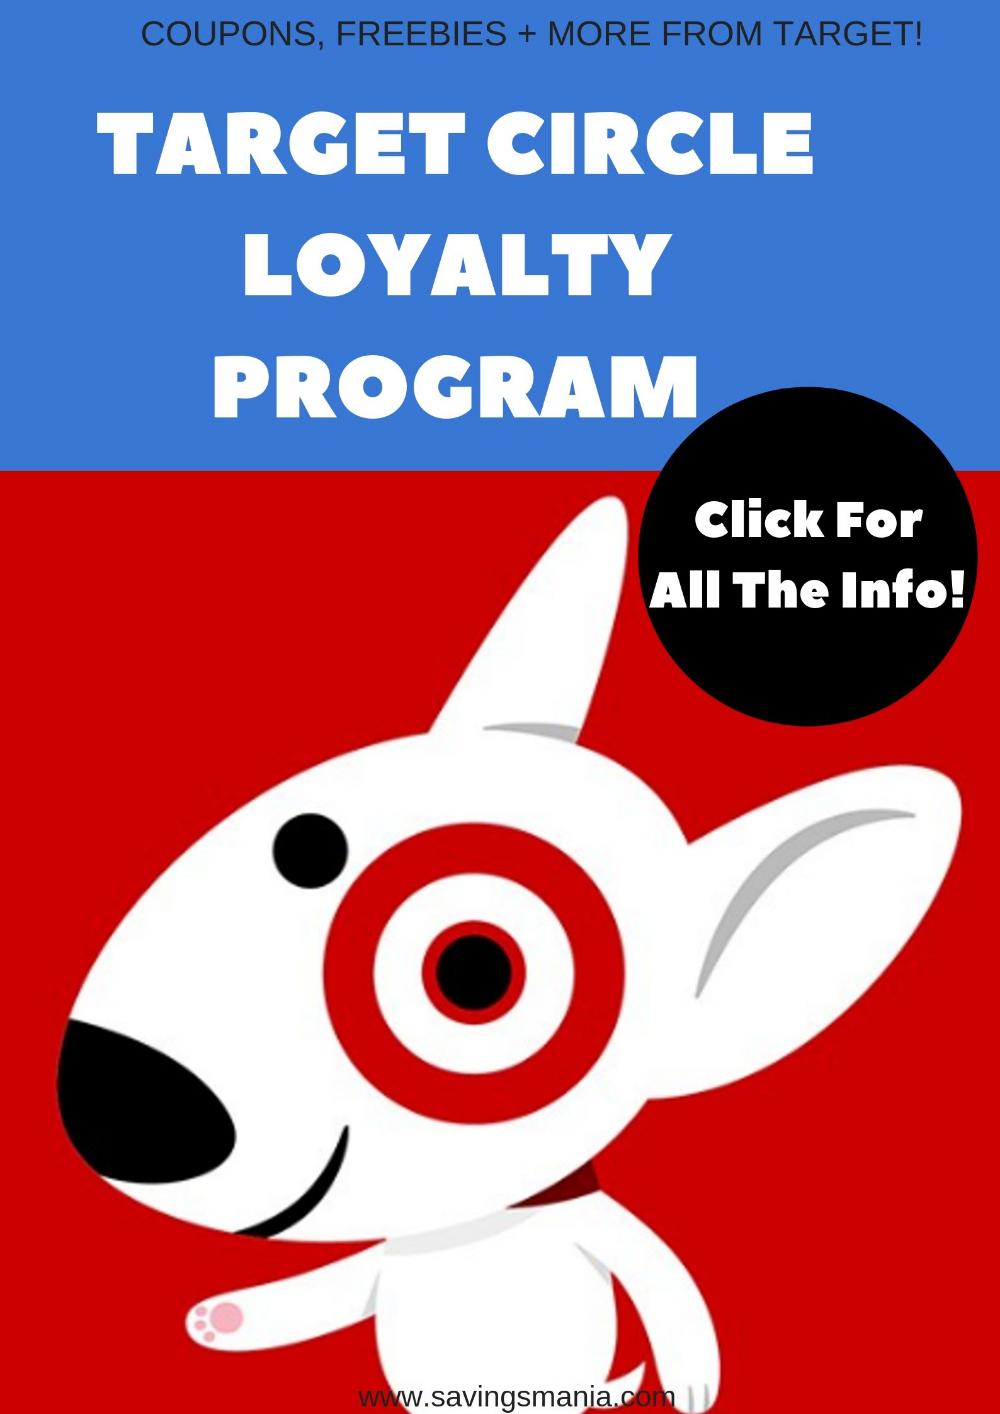 Target Circle Loyalty Program Target Deals